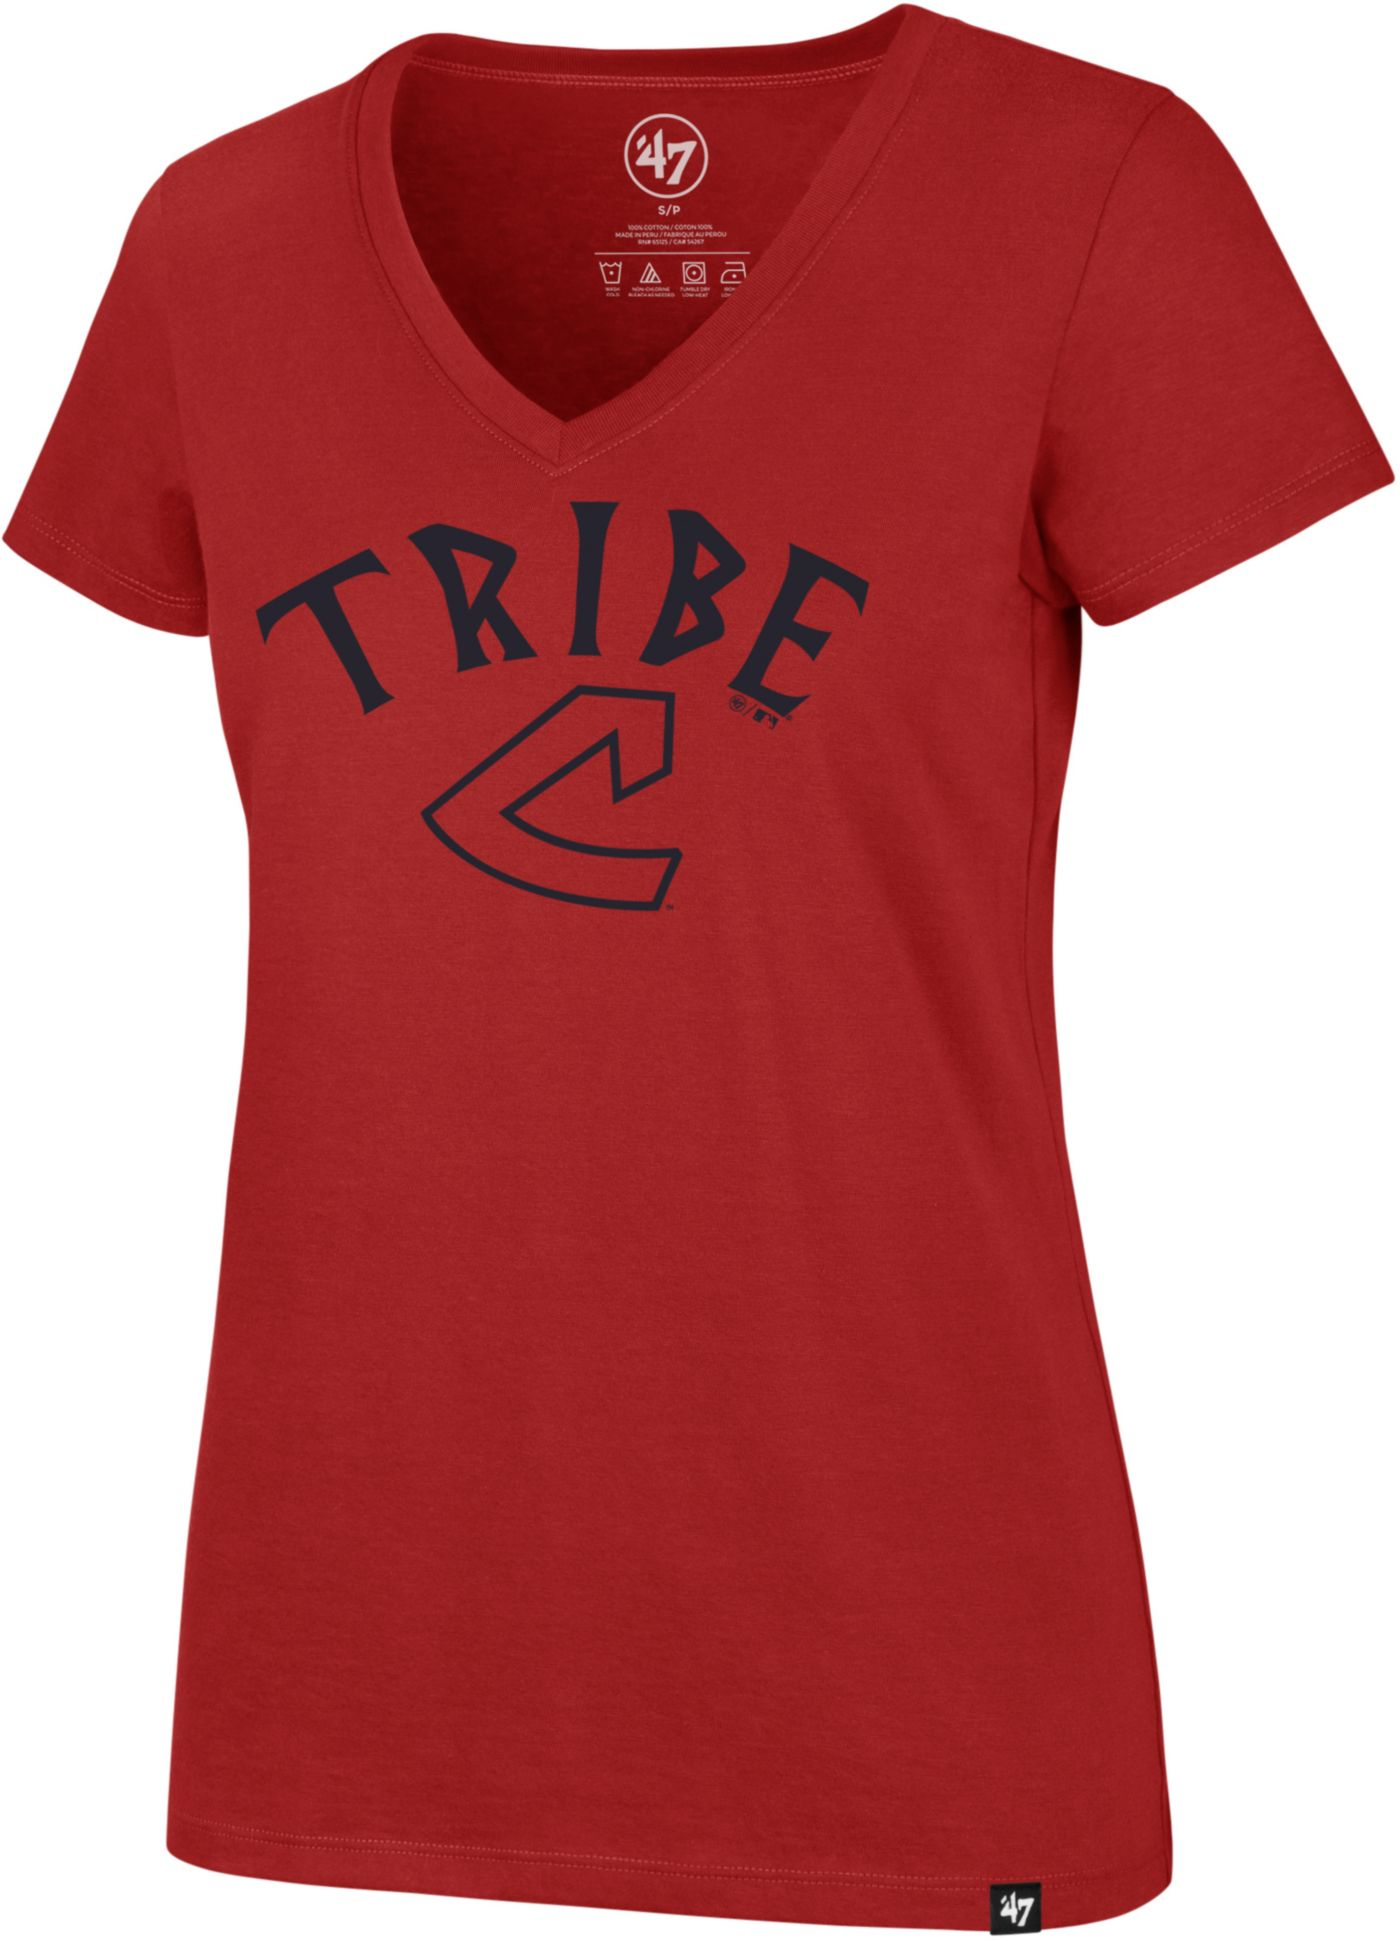 '47 Women's Cleveland Indians Ultra Rival V-Neck T-Shirt